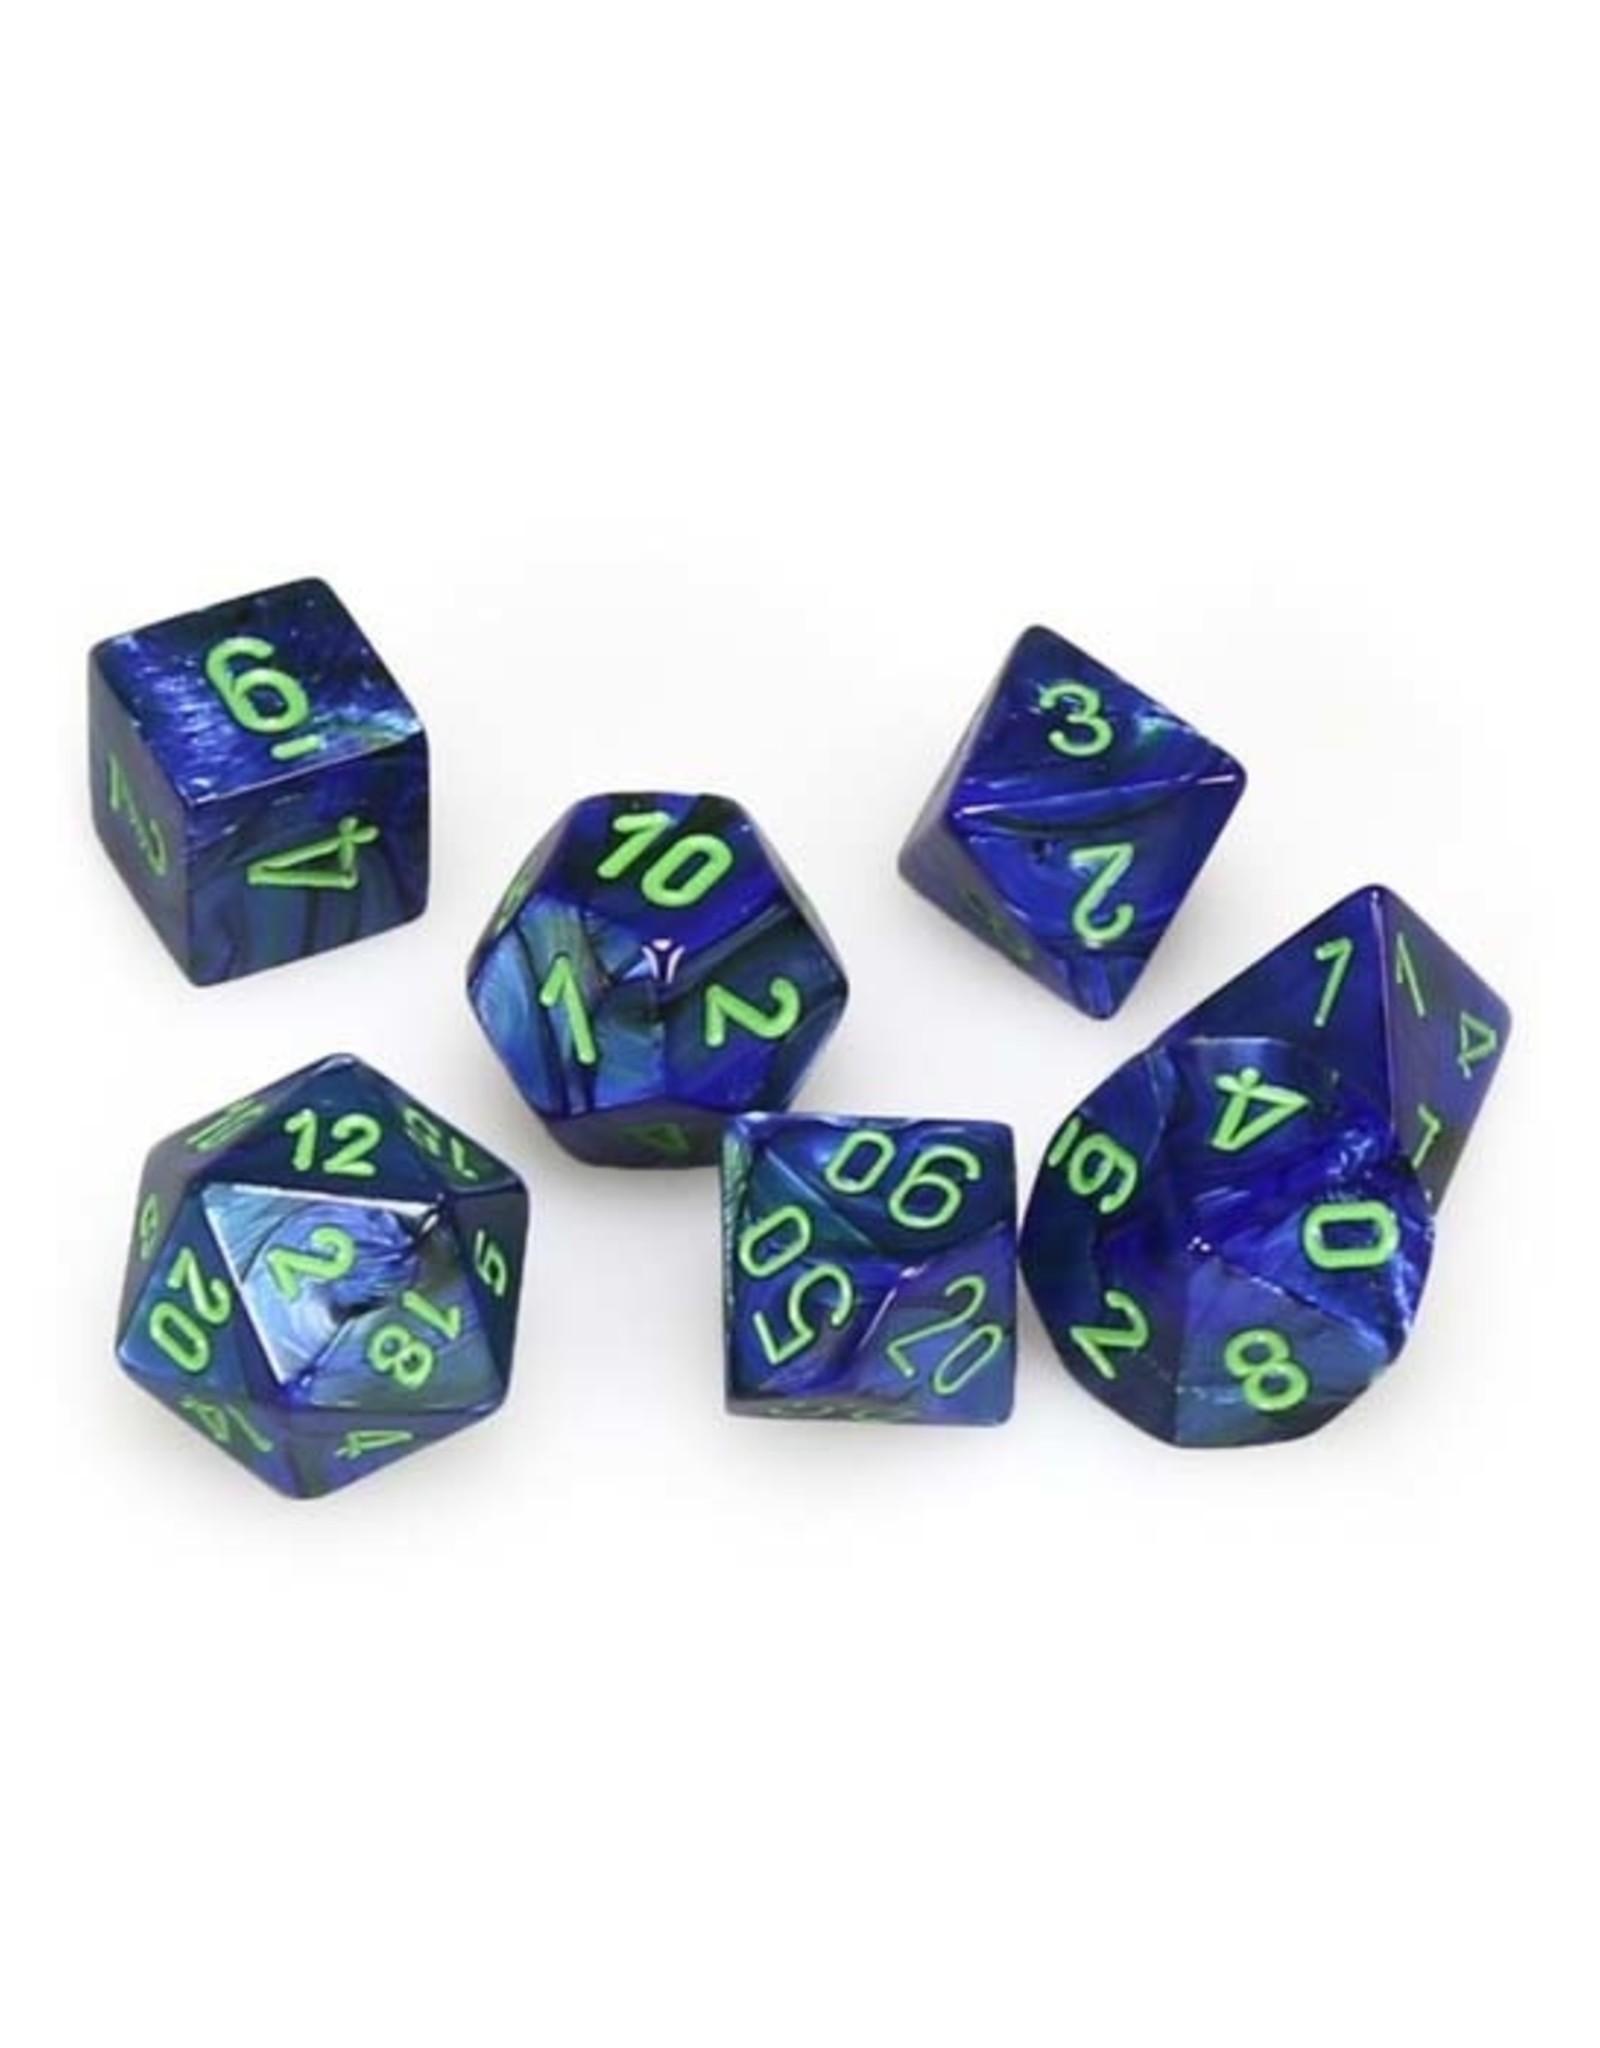 Chessex Chessex: Poly 7 Set - Lustrous - Dark Blue w/ Green